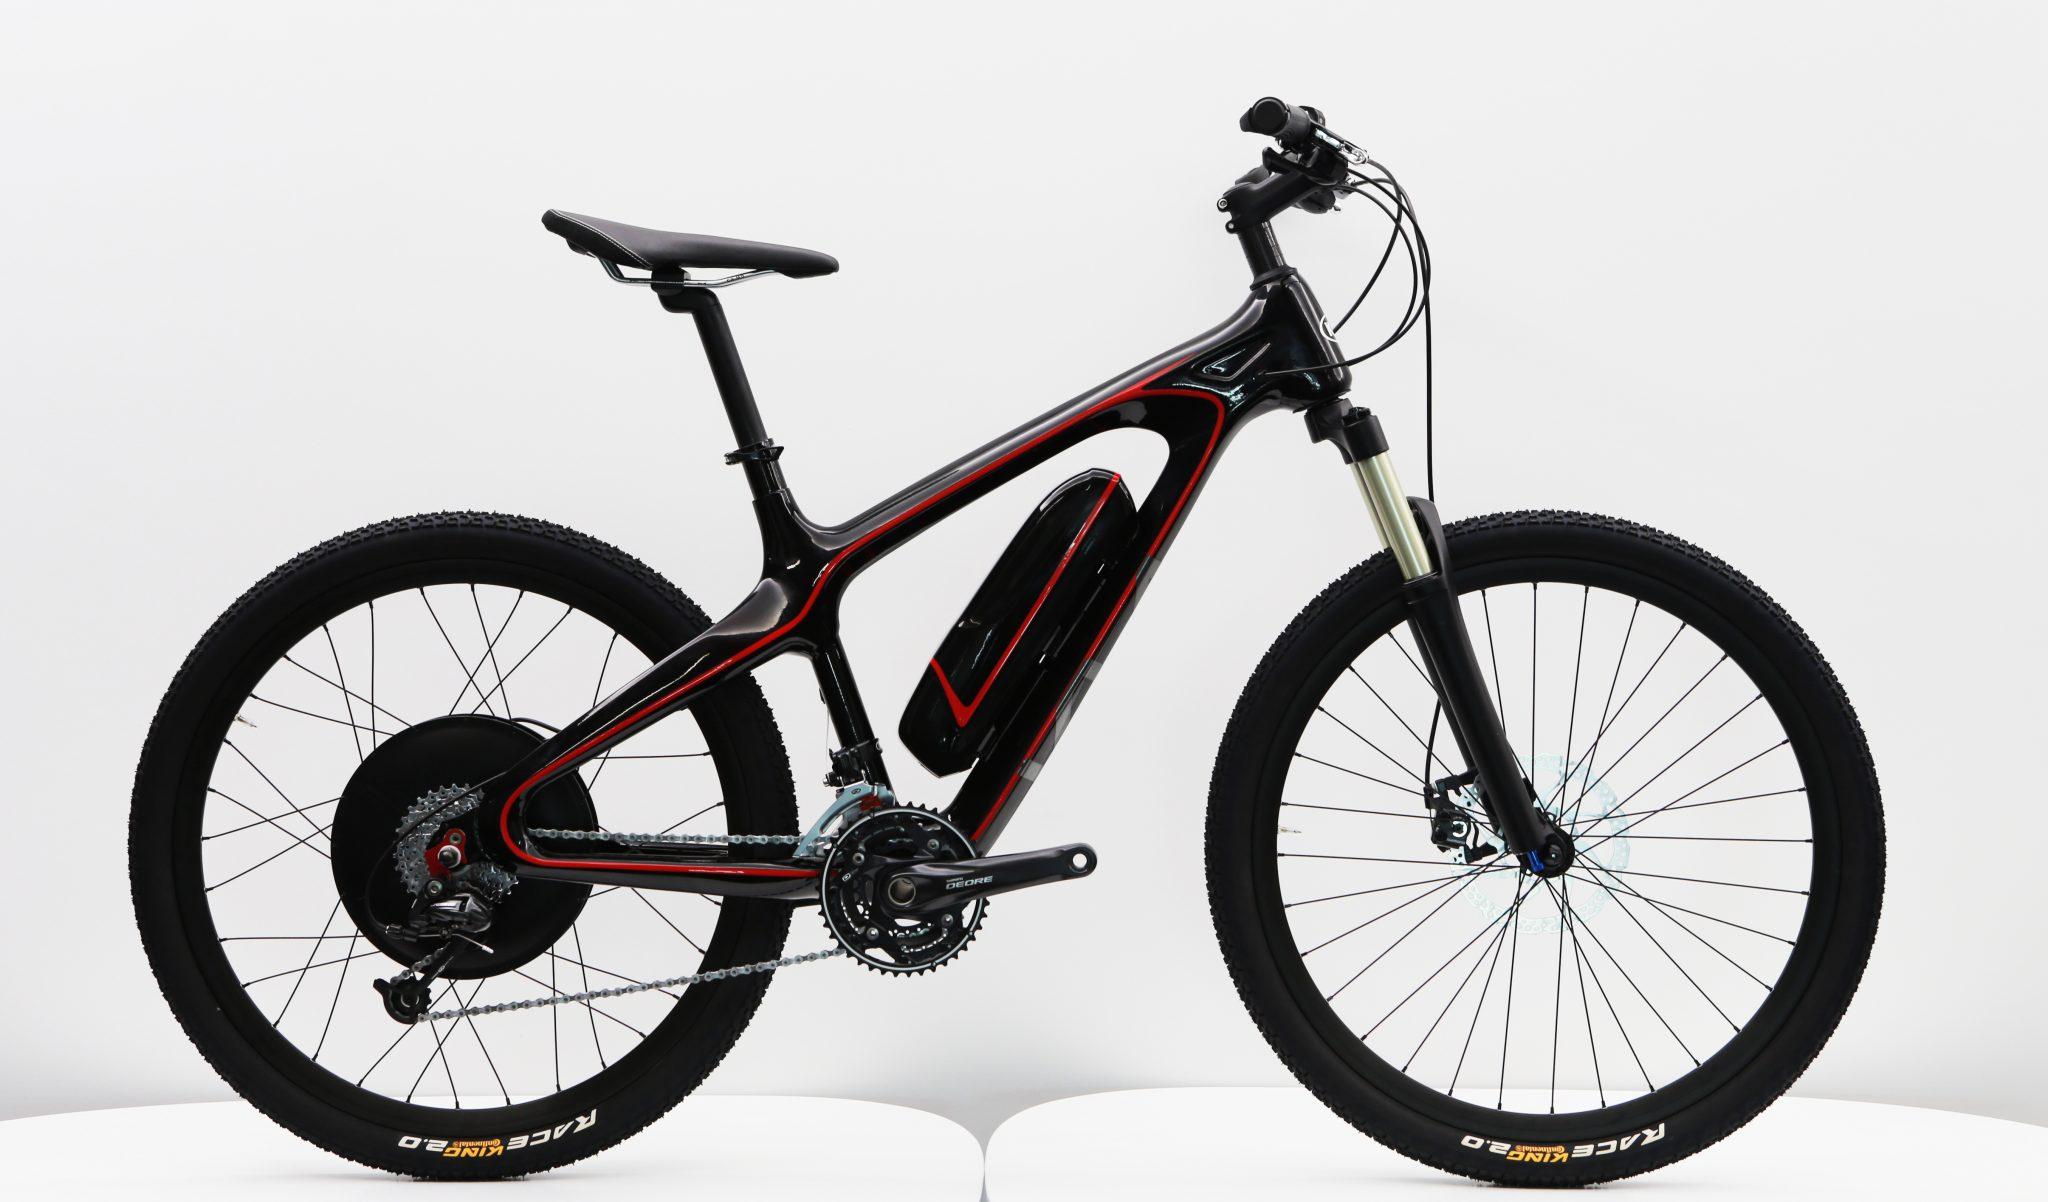 NS Bikes Analog 2014 review - The Bike List